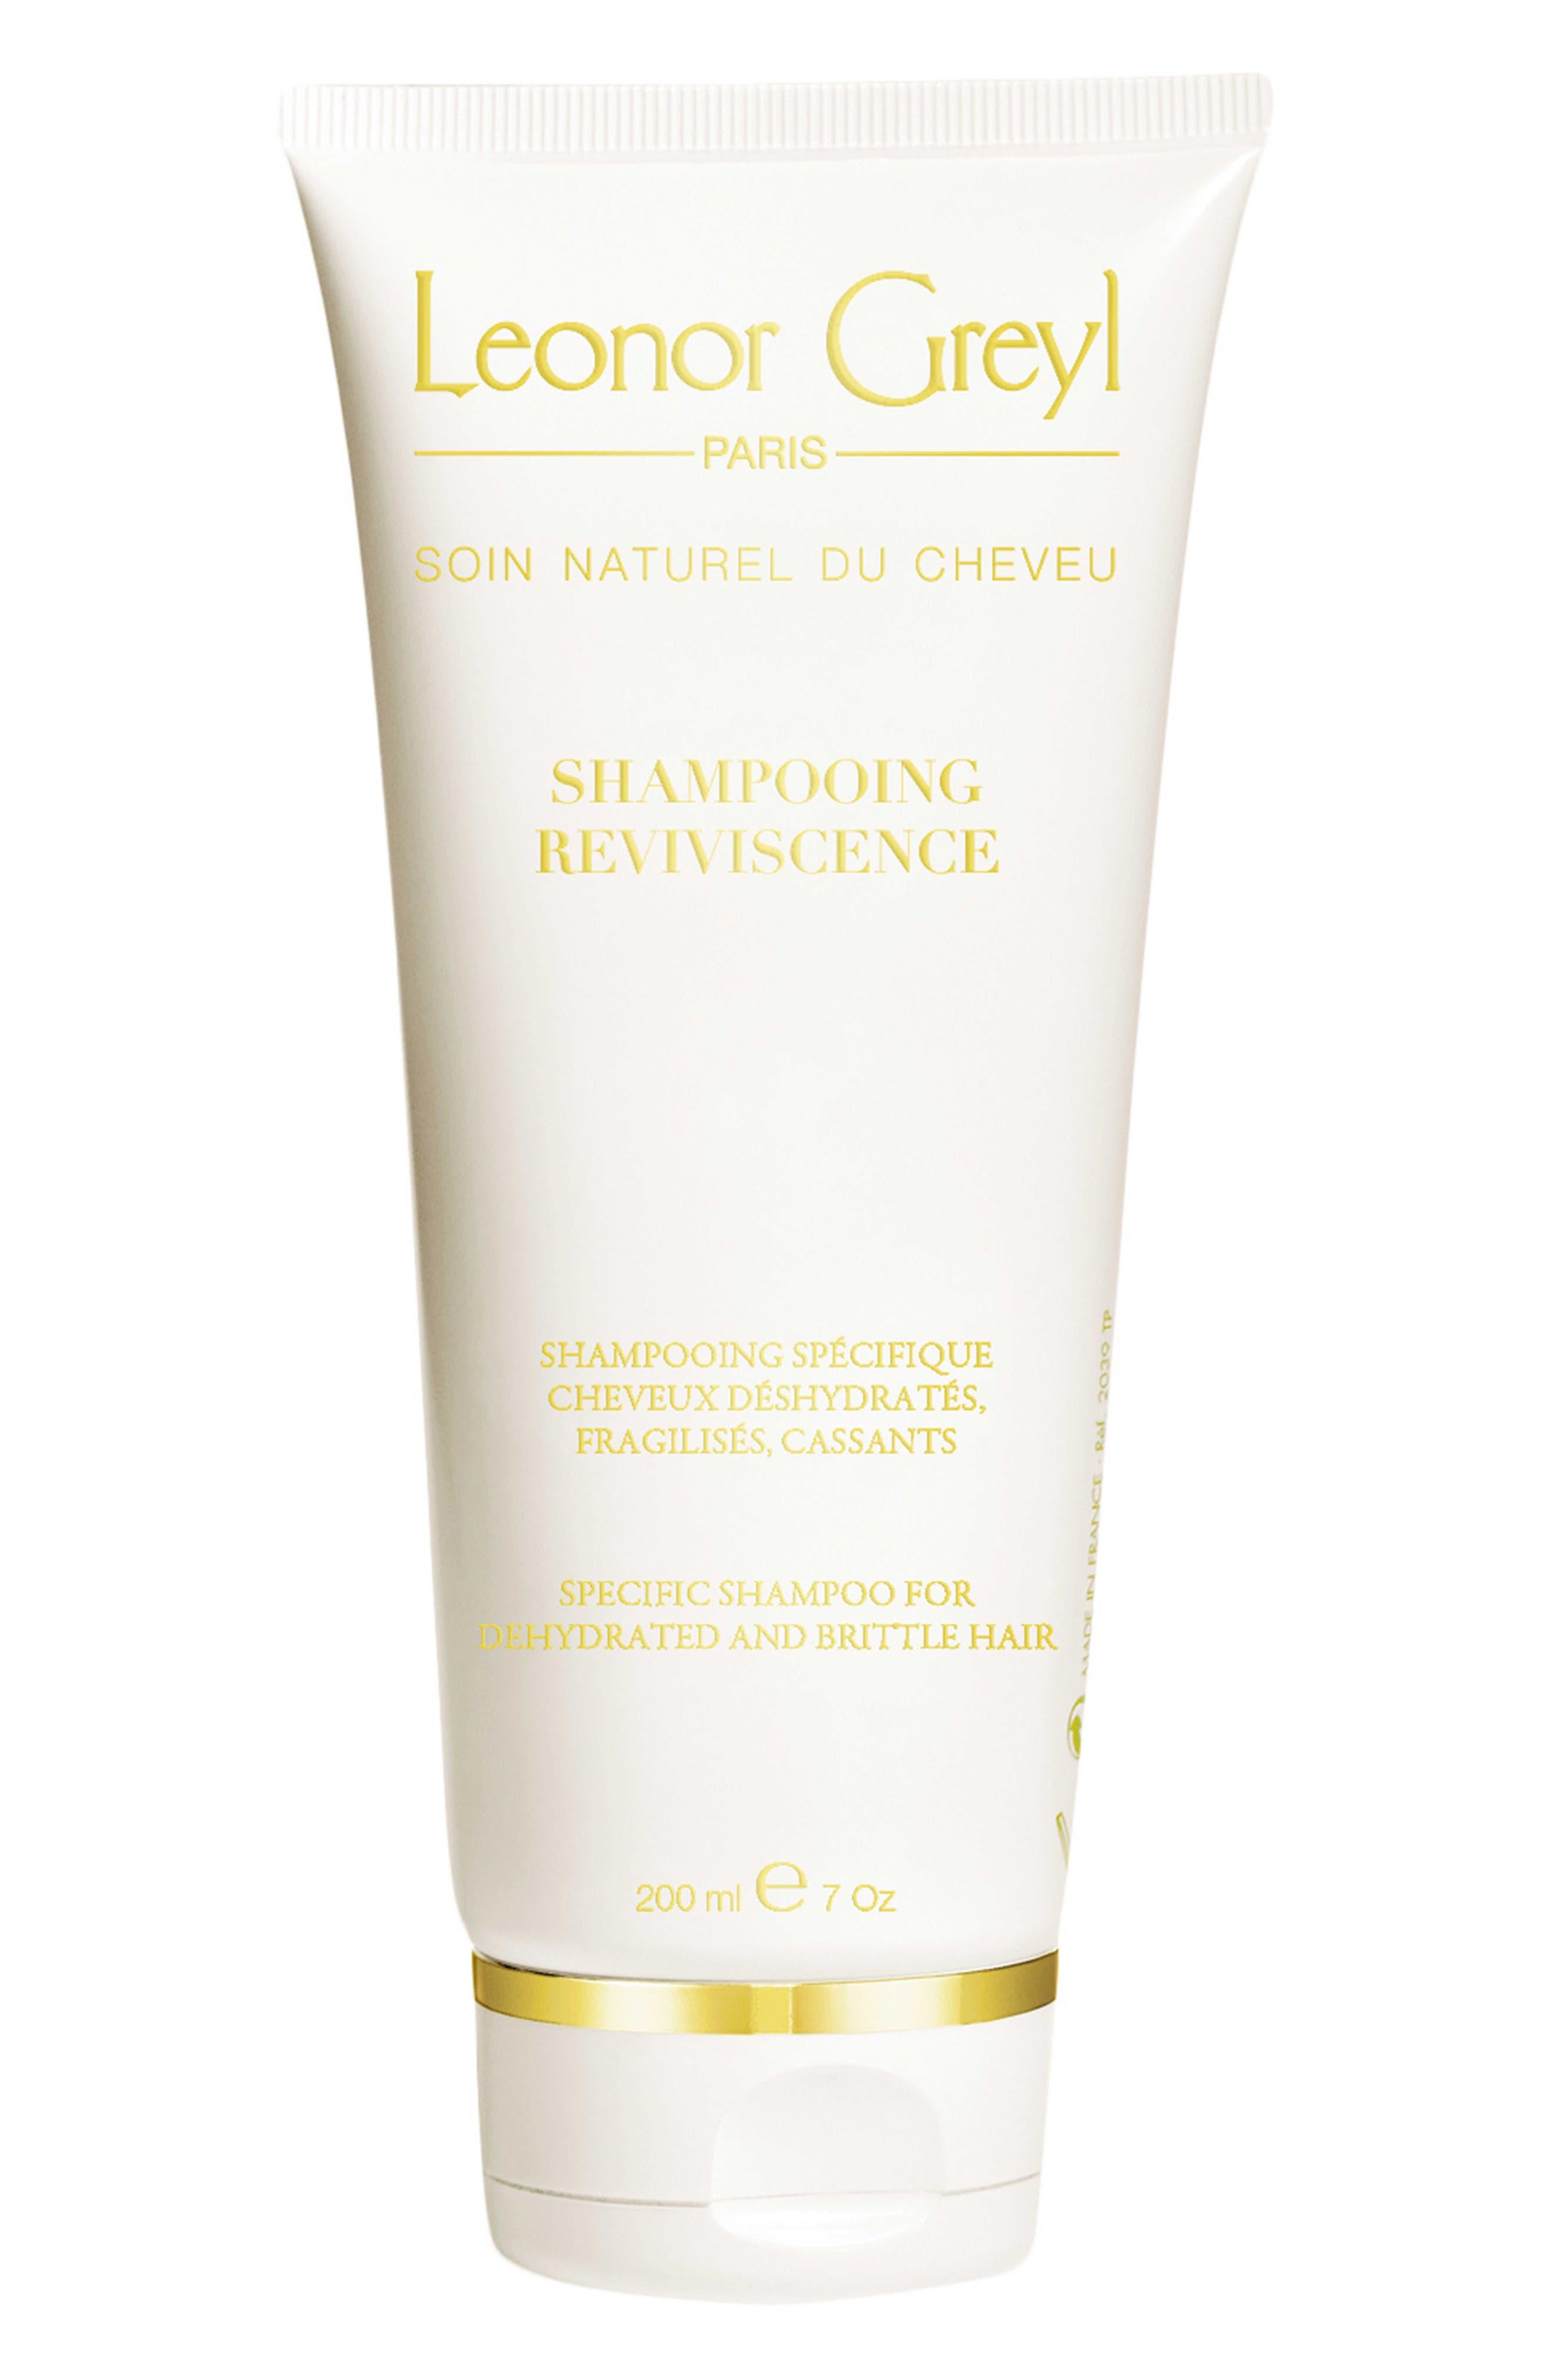 Leonor Greyl PARIS 'Shampooing Reviviscence' Repairing Shampoo